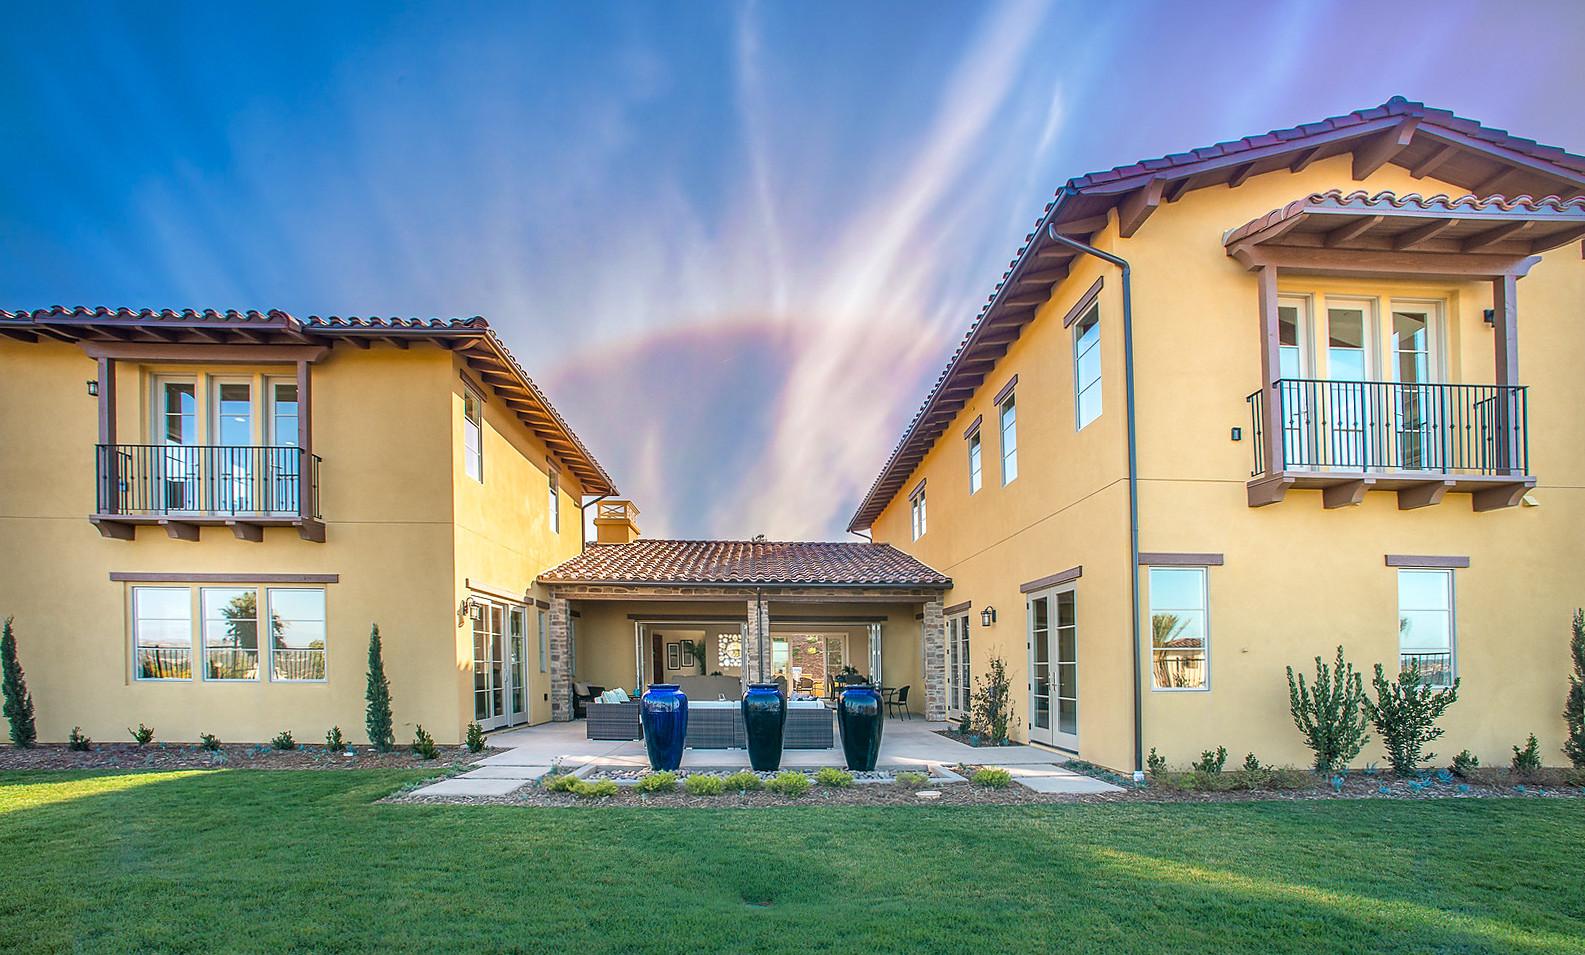 6593 Mesa Norte Dr,-San Diego, CA 92130-